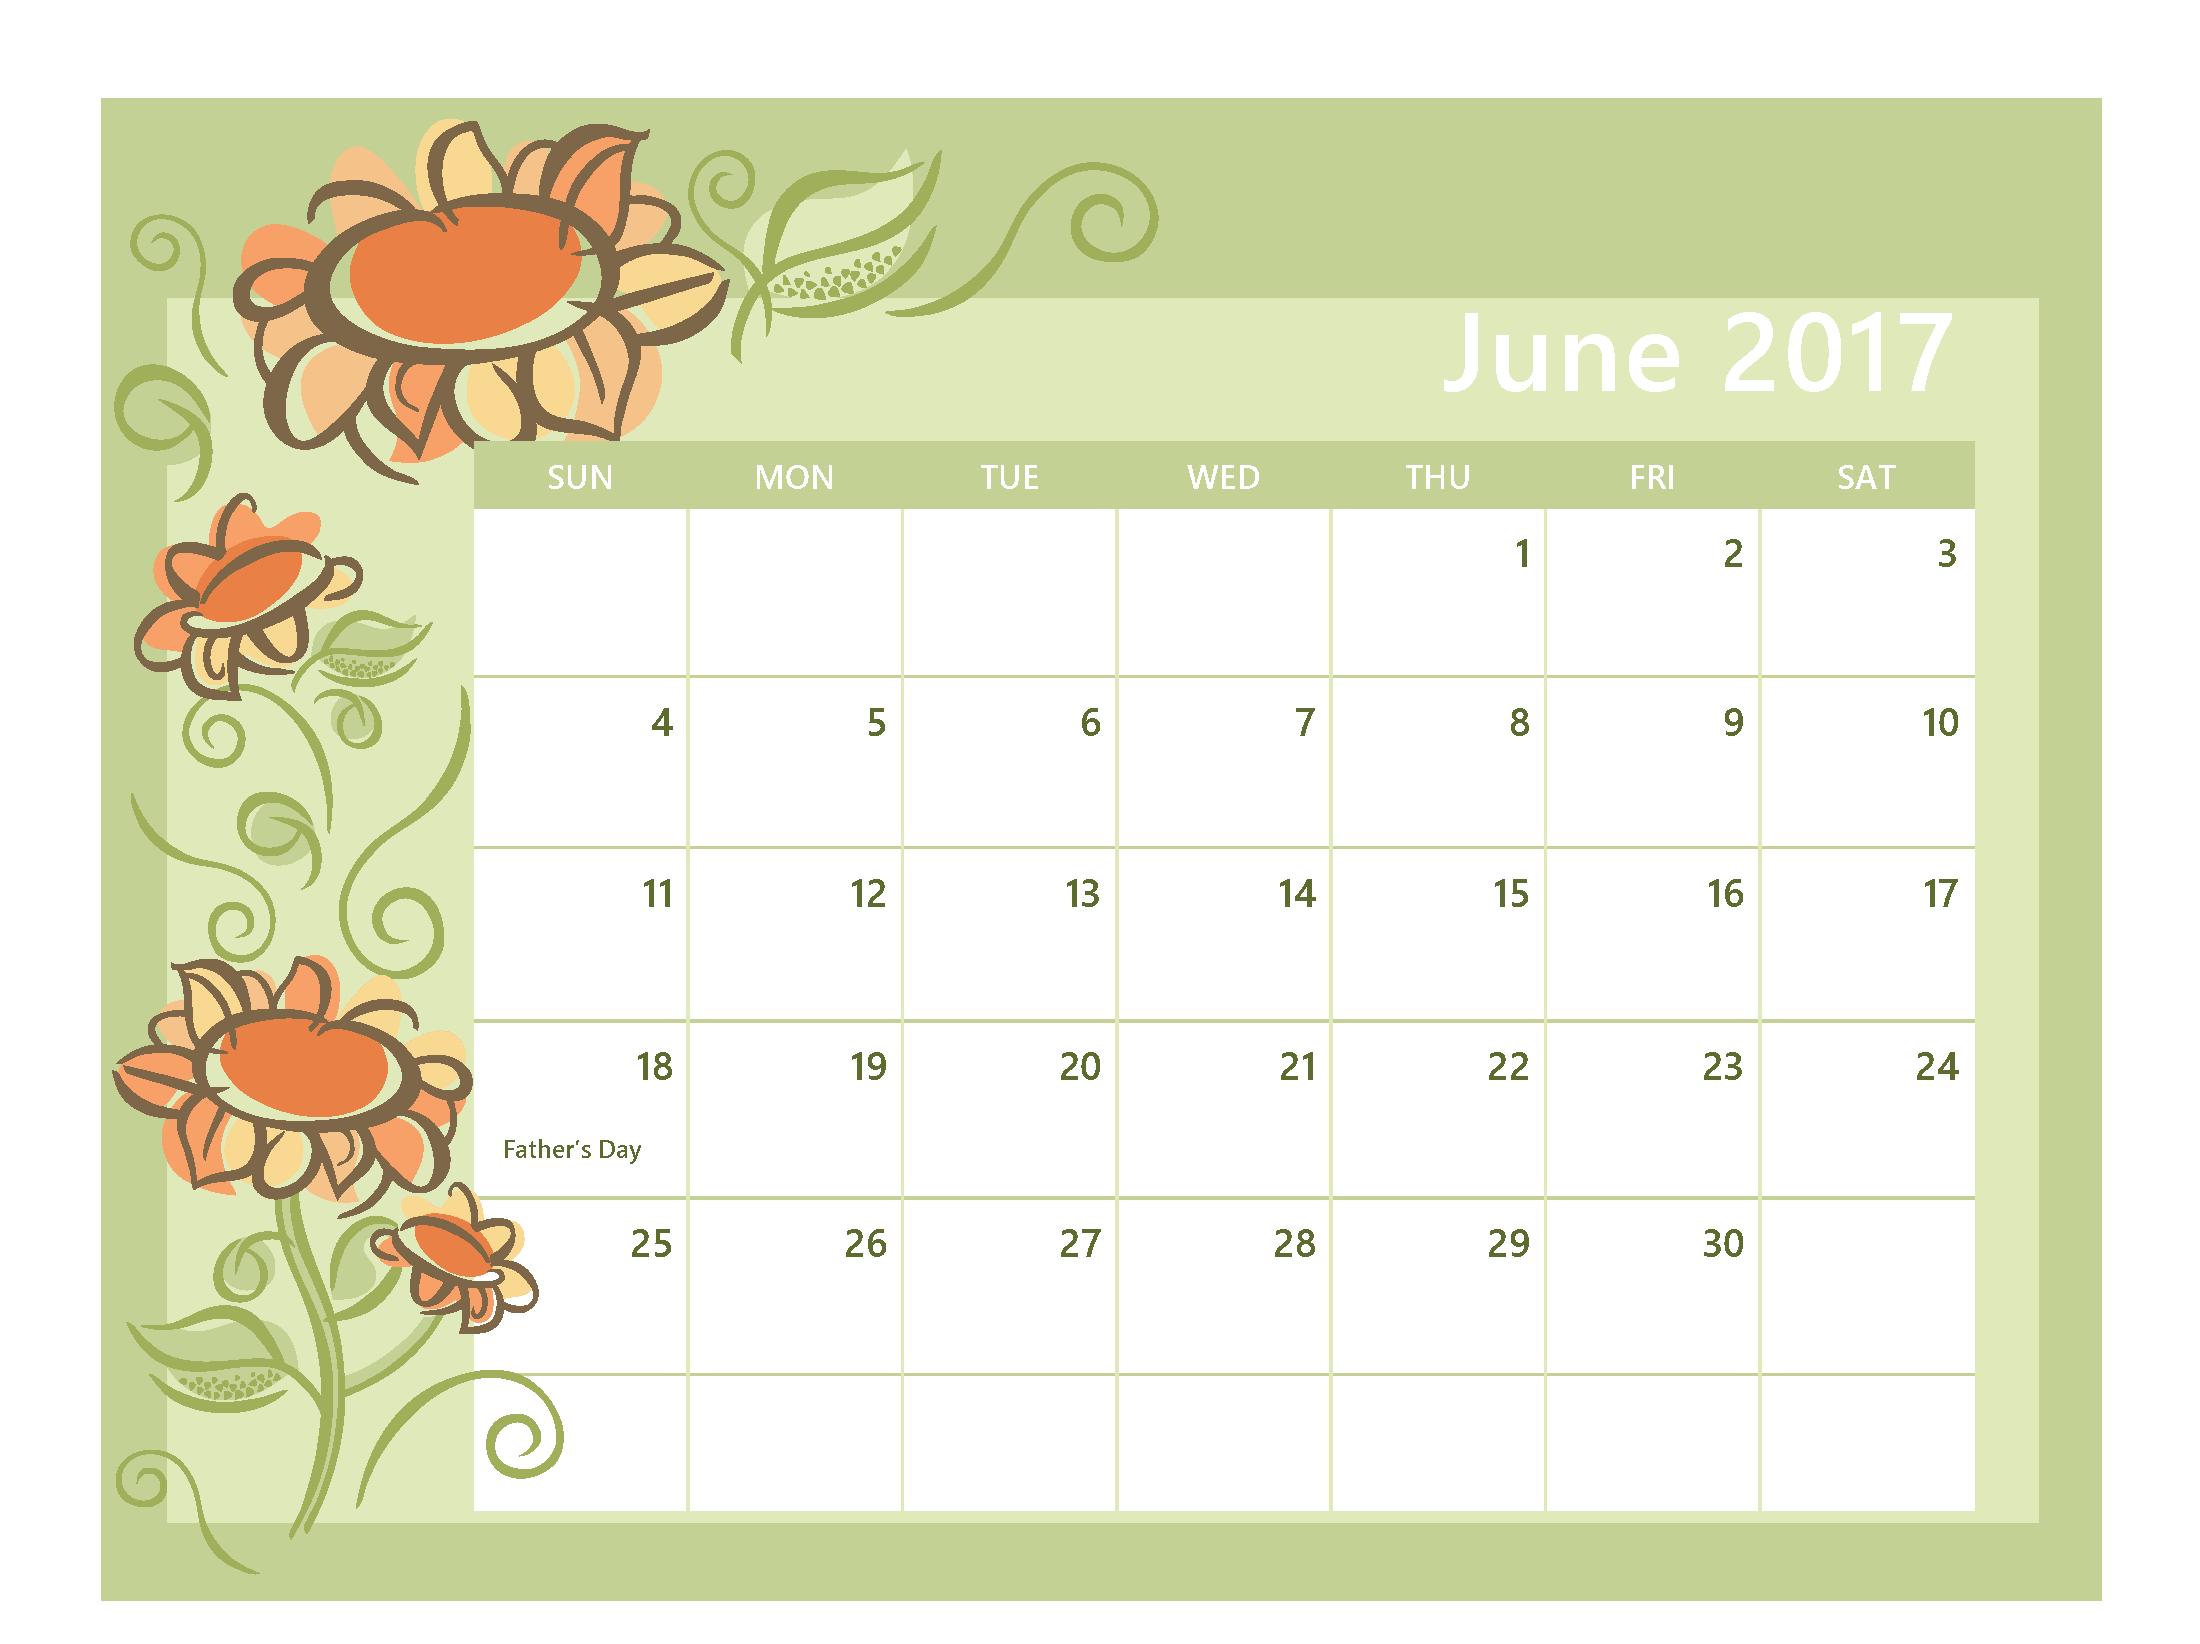 June Month 2017 Clip art Free Images Download